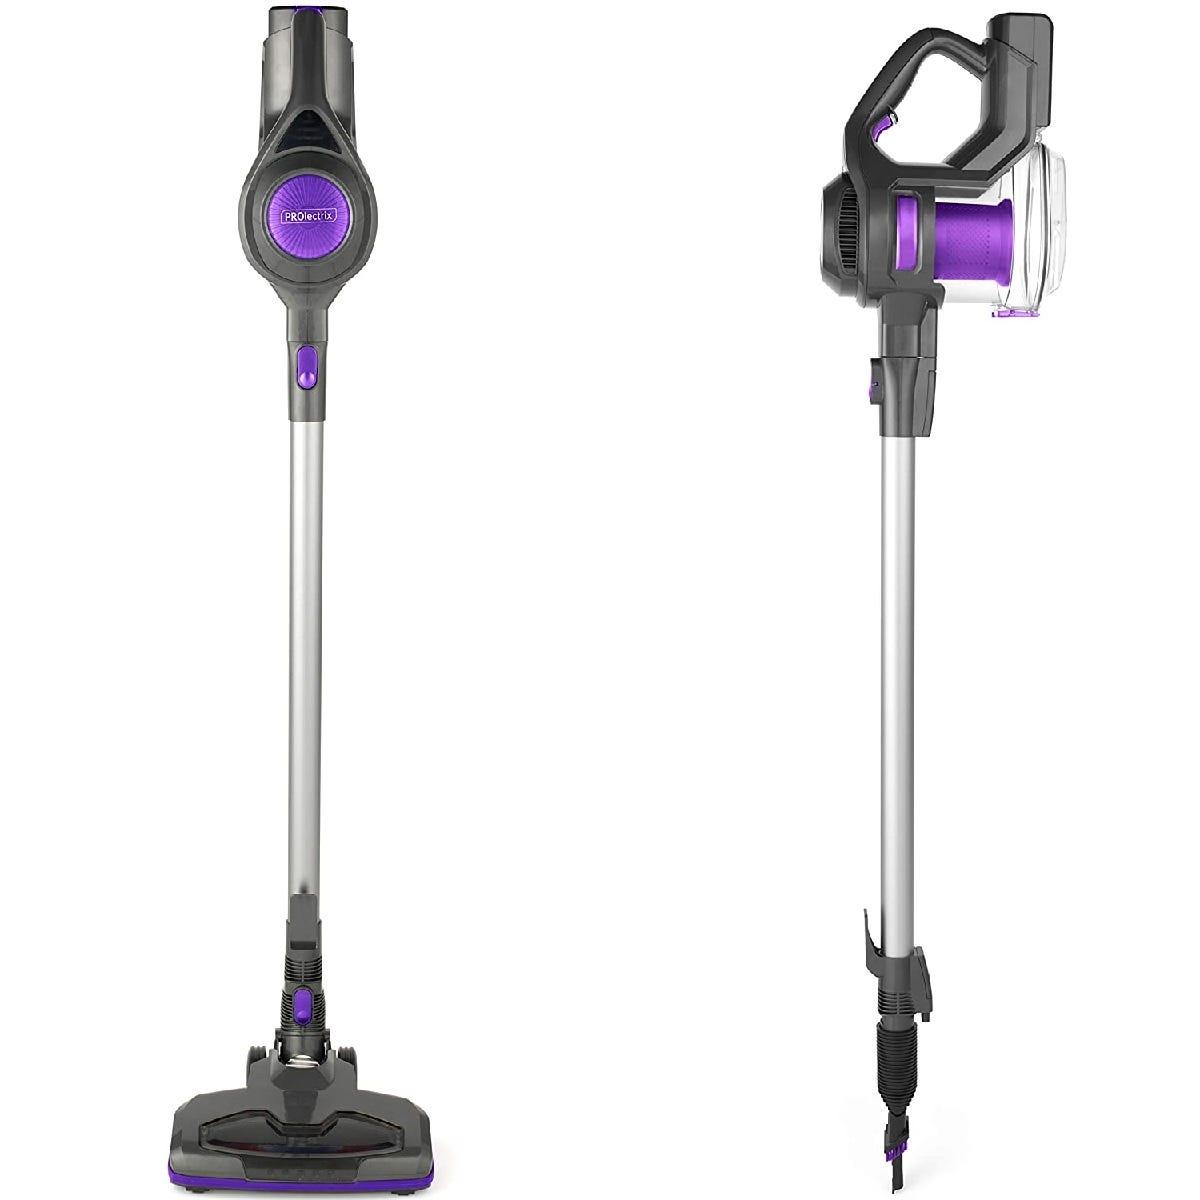 Prolectrix EF0776BGP 2 in 1 Cordless Pro 100W Vacuum Cleaner - Purple/Grey